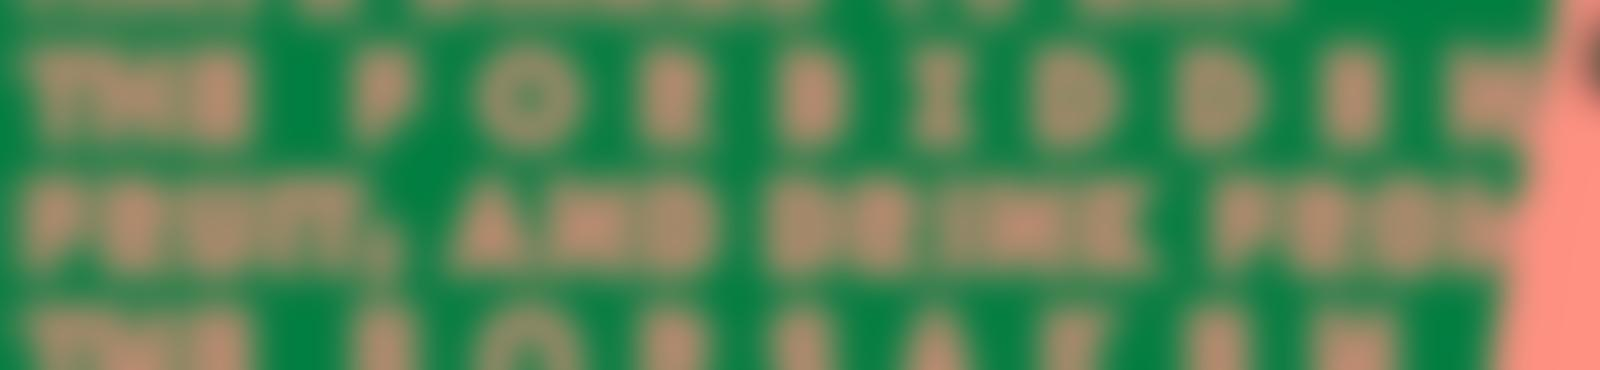 Blurred 324ae83c 9ddd 4d2c 85f5 acc99c3e2014